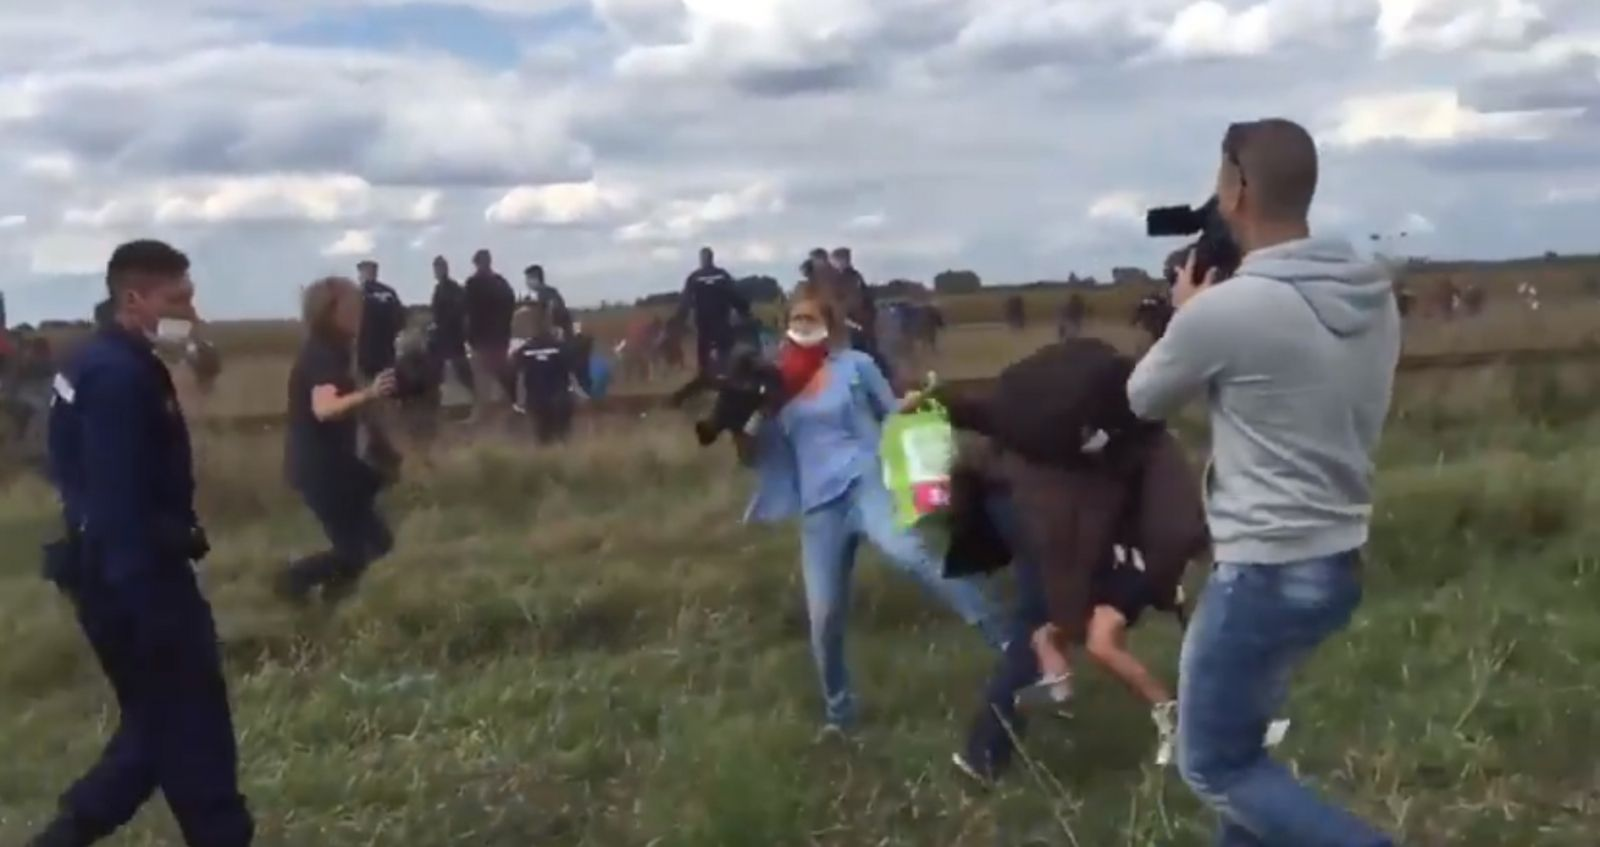 Hungary camerawoman trips refugee